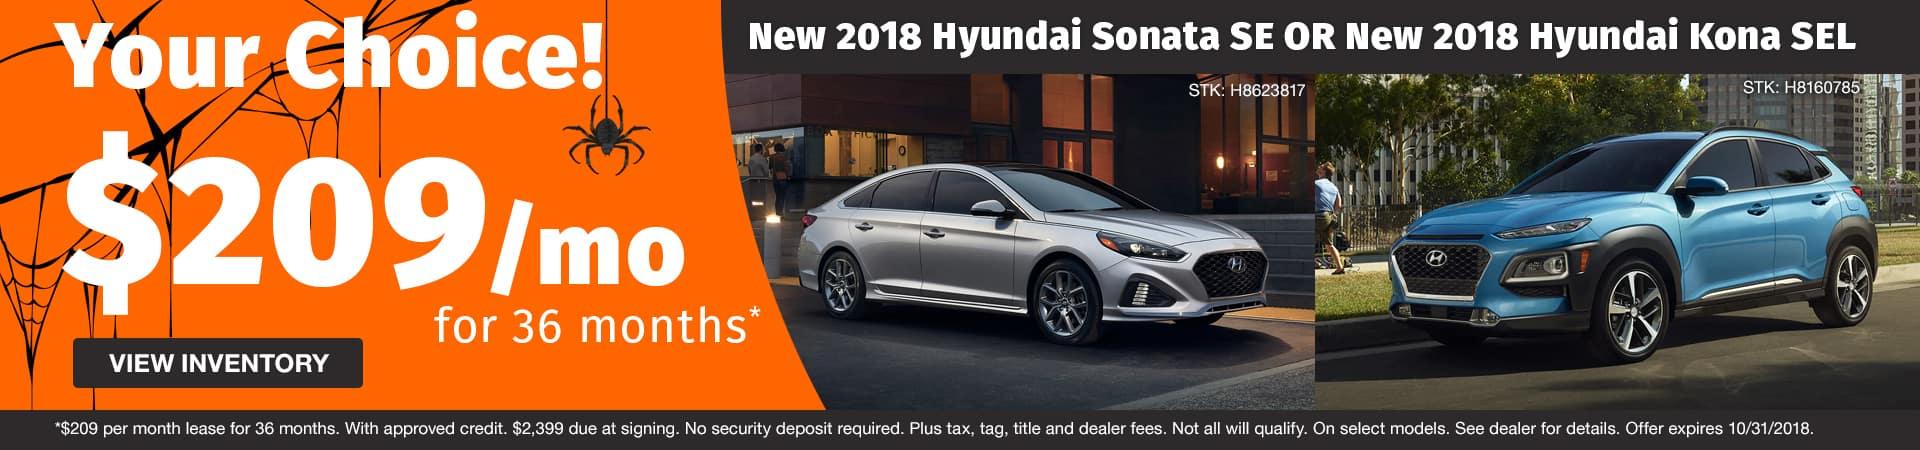 Drive a new 2018 Hyundai Sonata SE or Kona SEL for just $209 a month in Murfreesboro TN